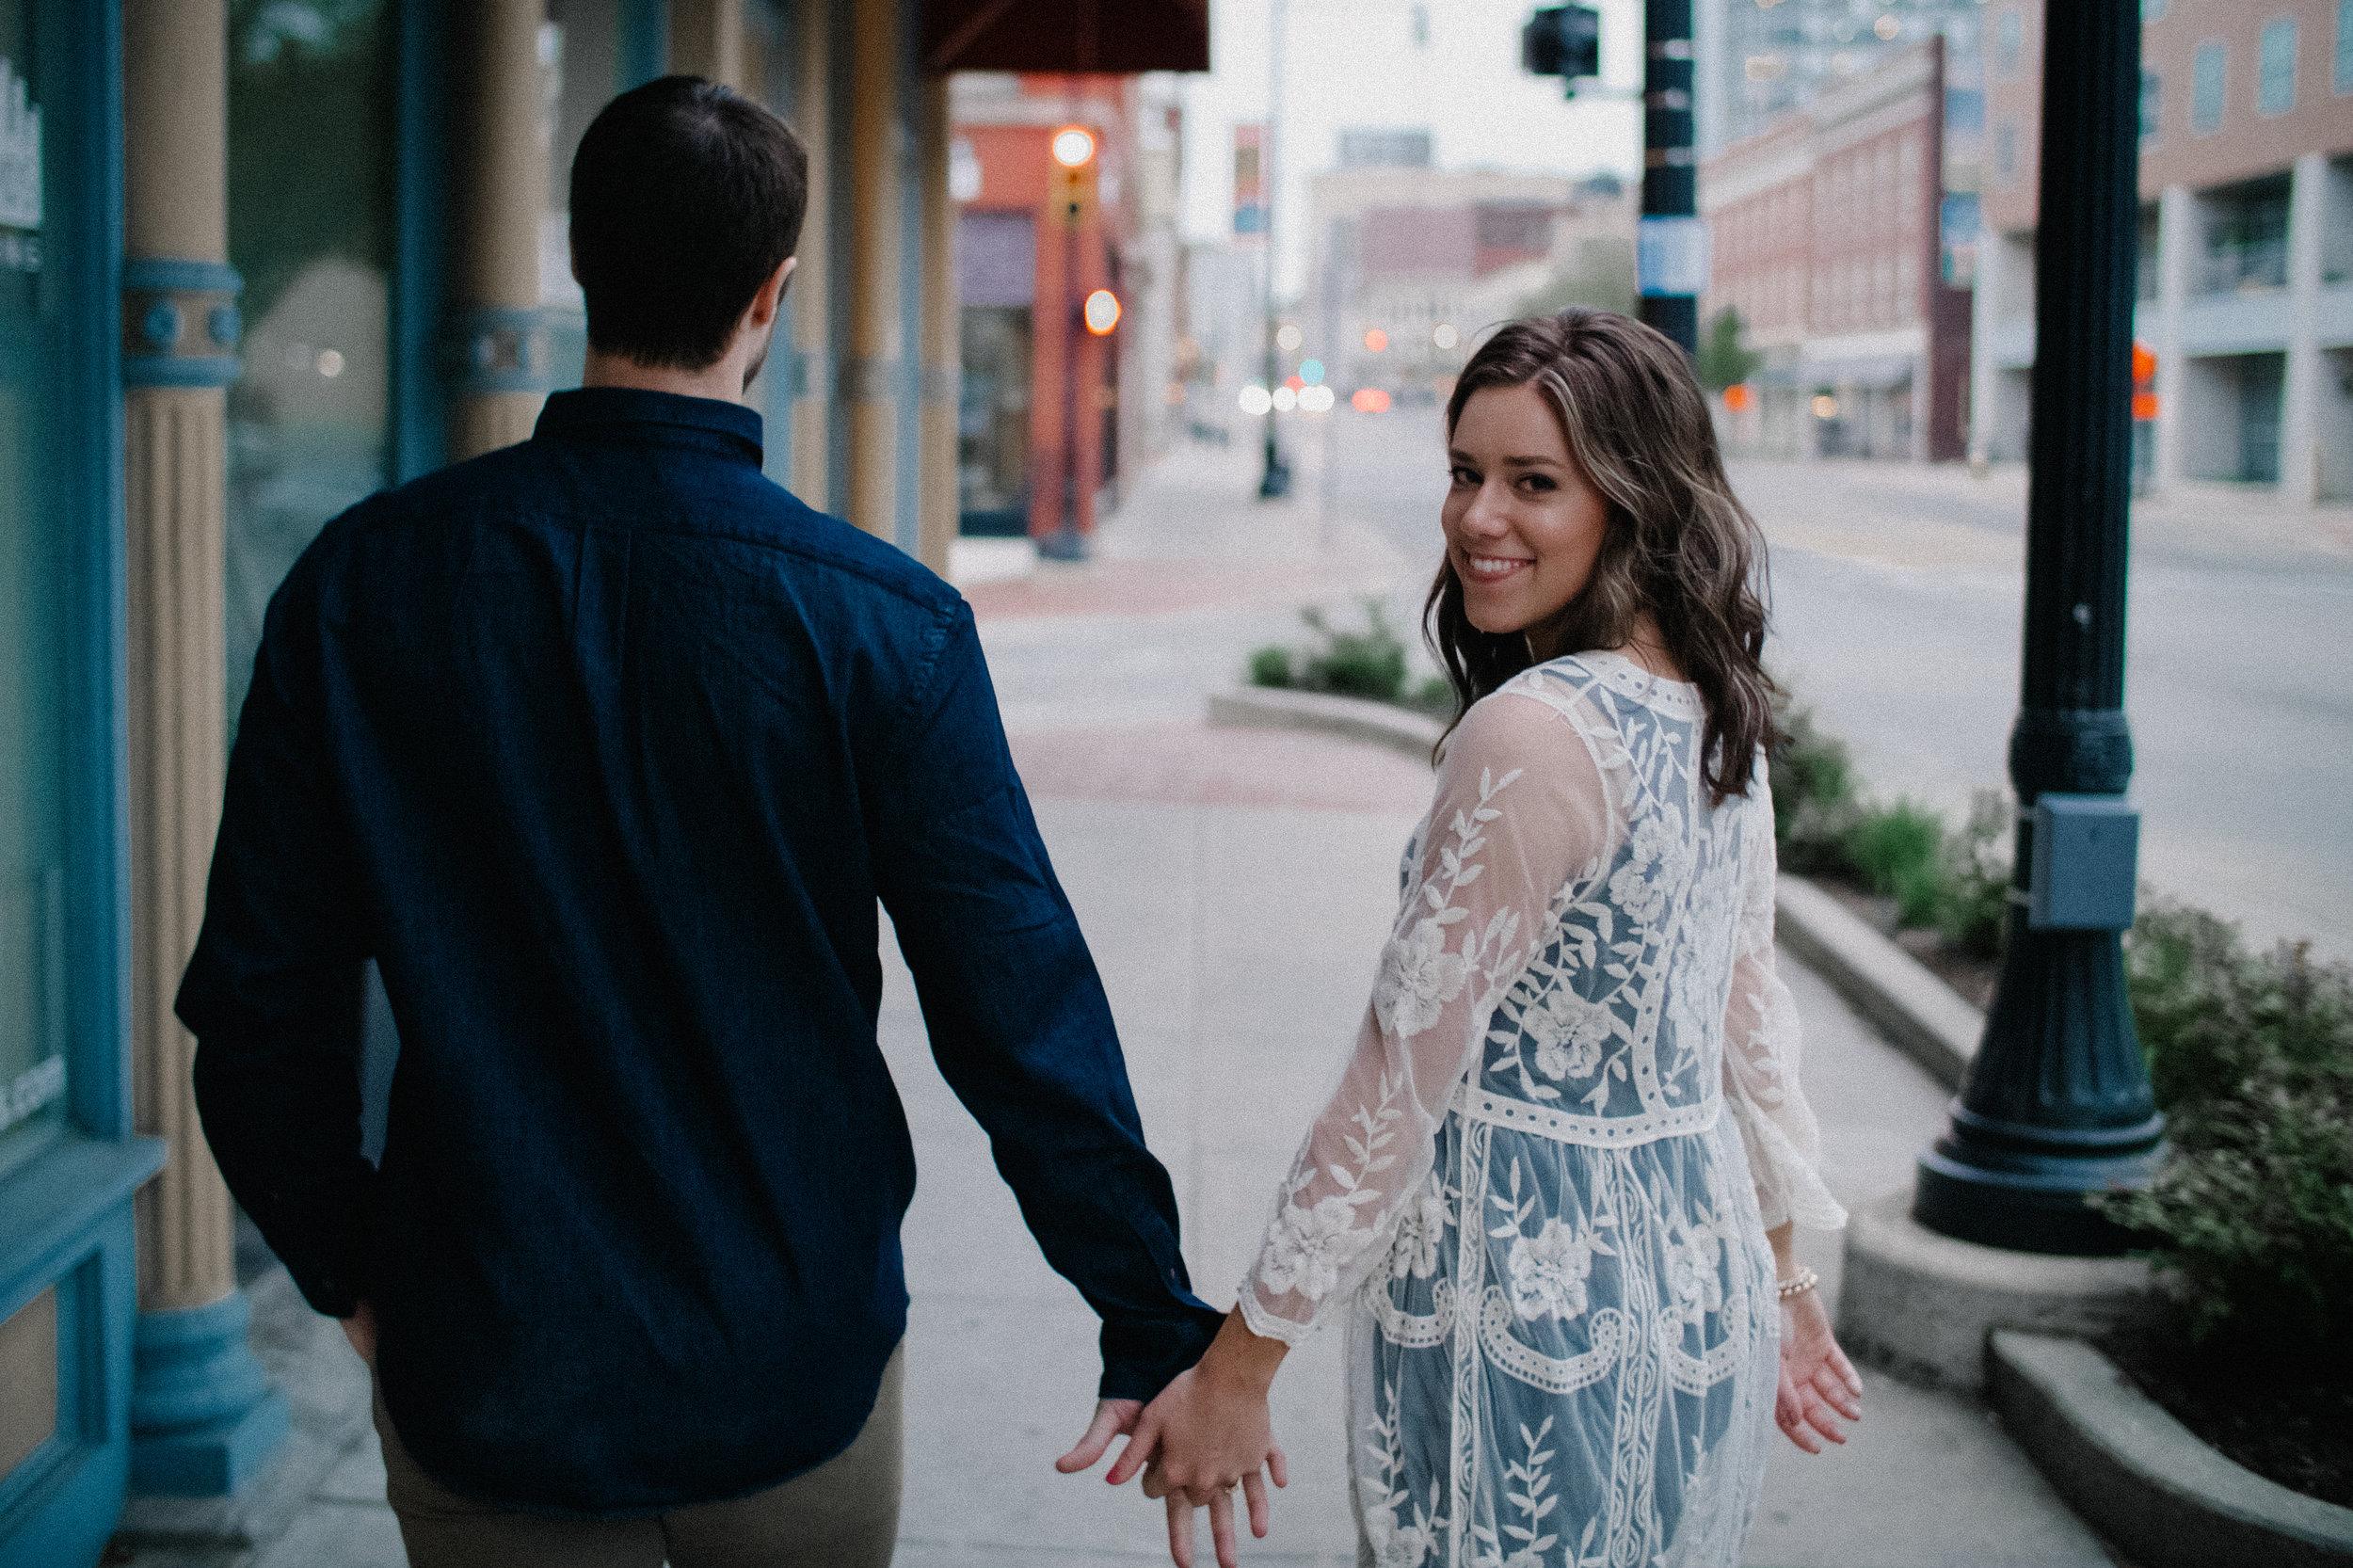 Lauren_Nick_Manzer_Bailey_Engagement_Photos_0188.jpg